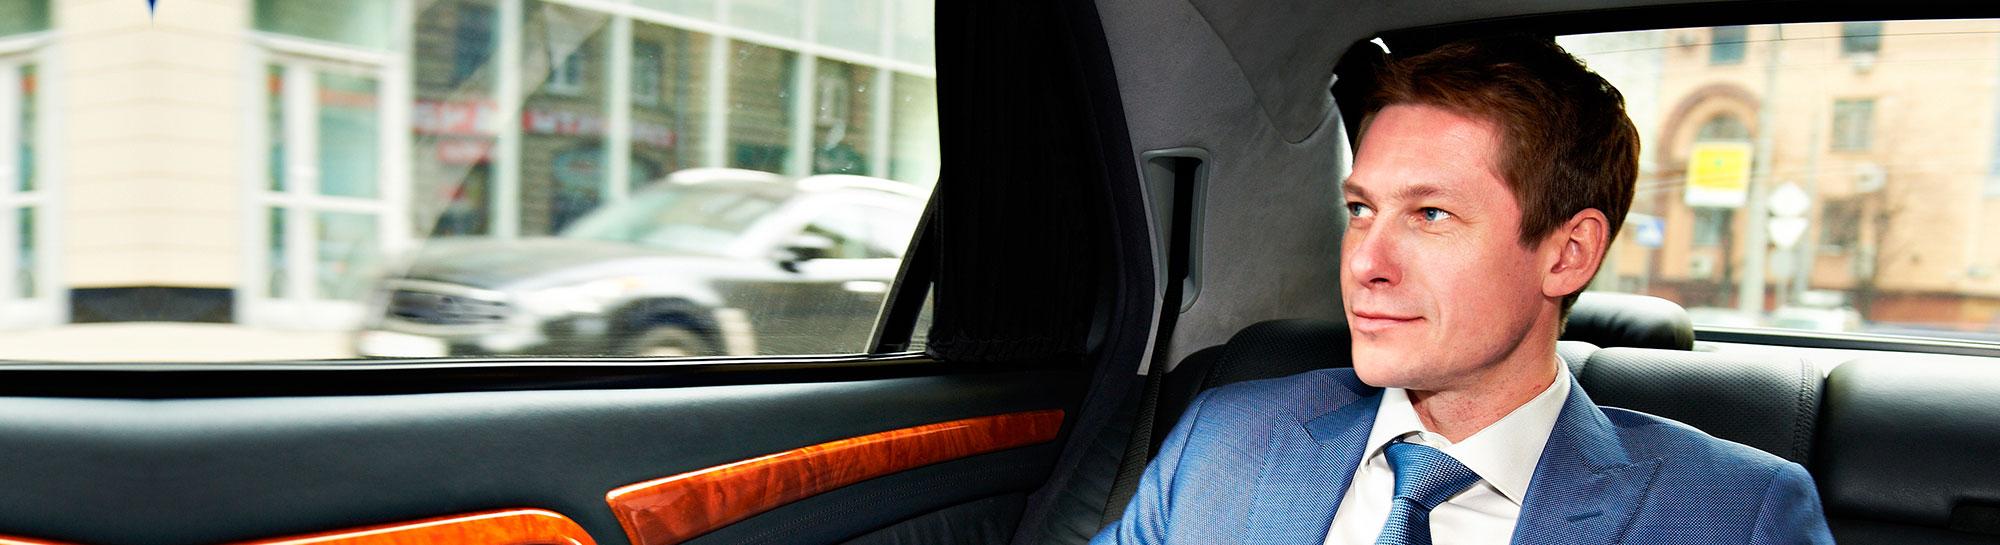 taxi fare calculator calculate the fare of your cab in. Black Bedroom Furniture Sets. Home Design Ideas